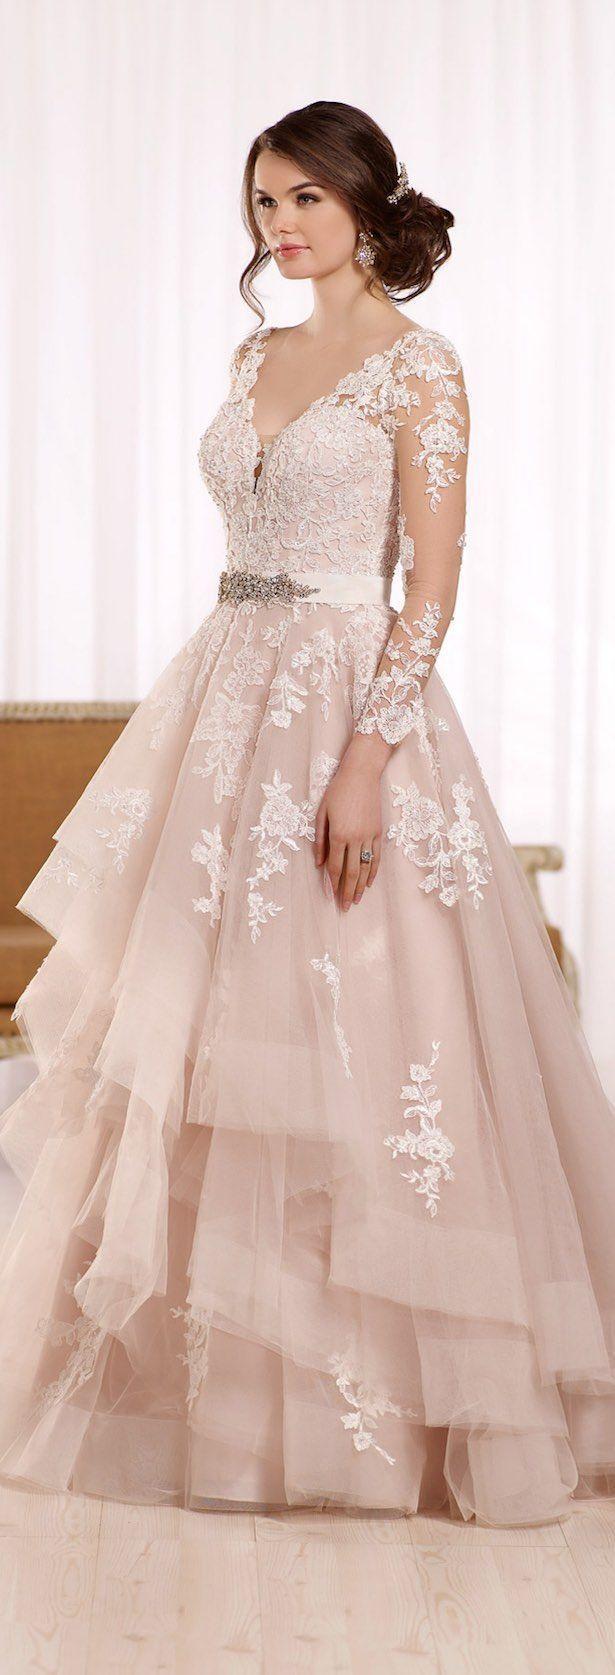 long wedding dress lace, wedding gown Essense of Australia Fall 2016 Wedding Dress #weddingdresses